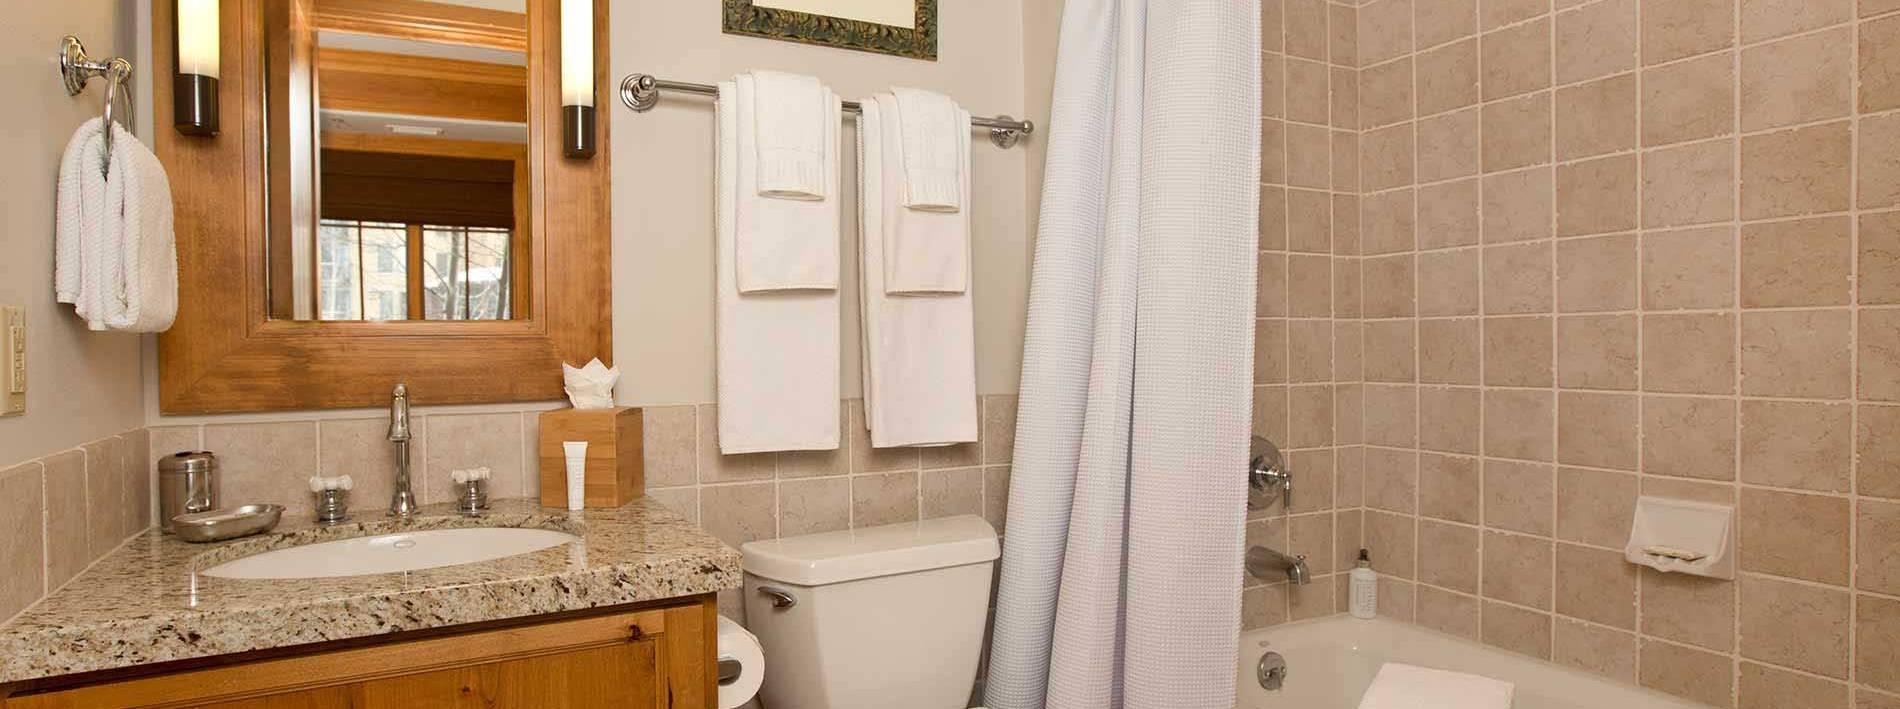 Arrowleaf bathroom